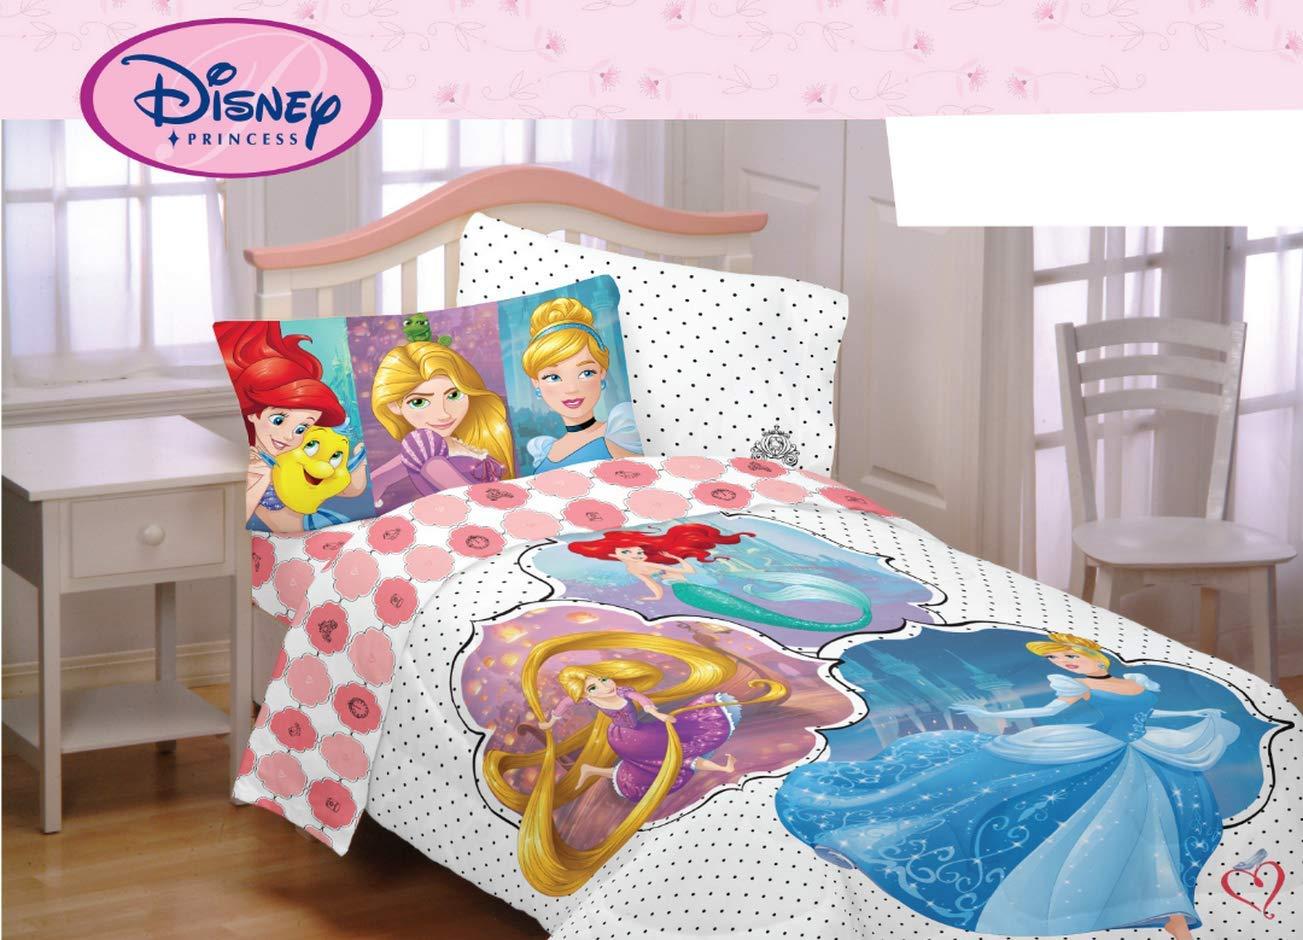 Disney Princess Comforter Twin Full Mermaid Ariel Tangled Cinderella